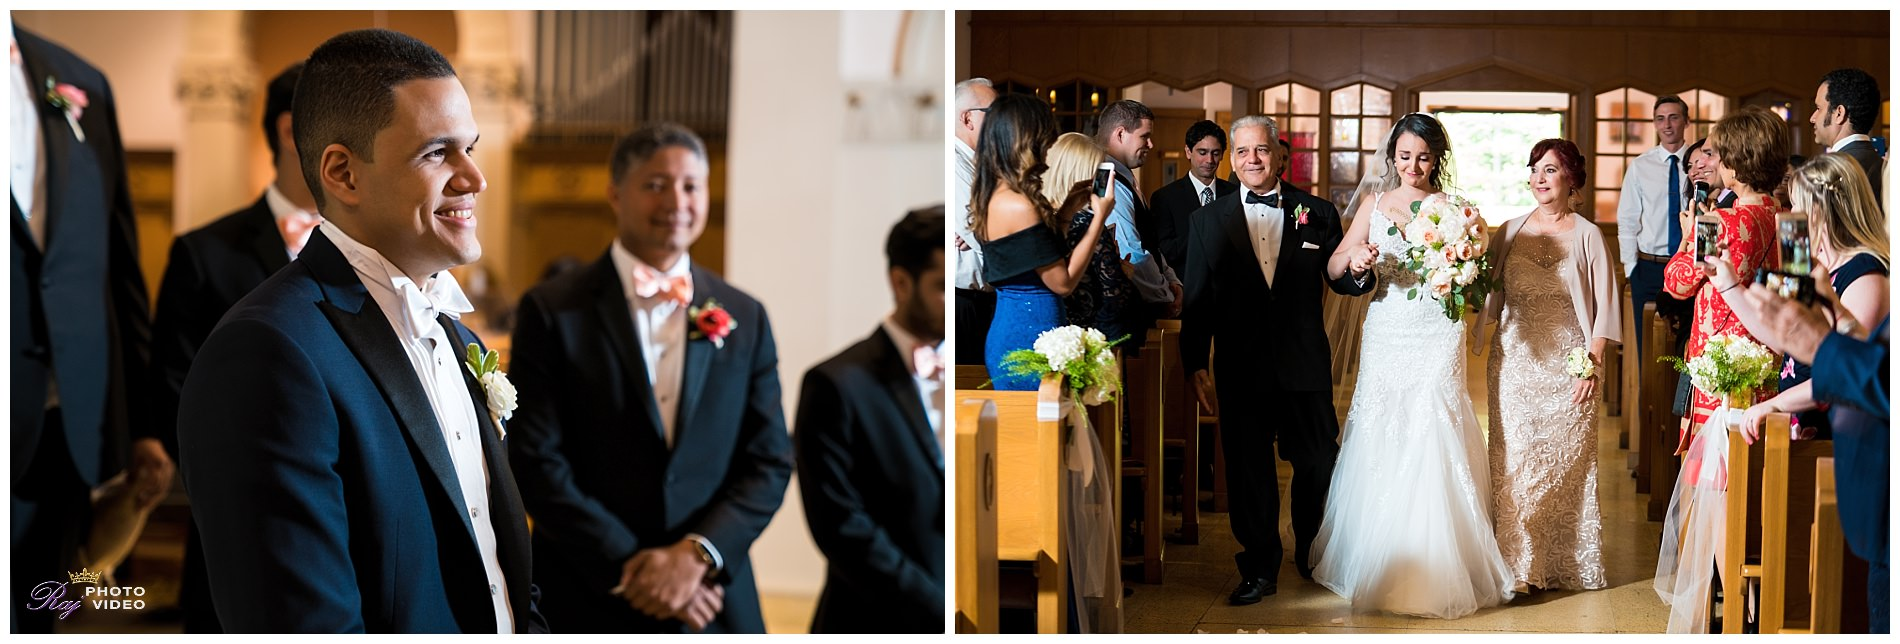 St-Valentines-Catholic-Church-Bloomfield-NJ-Wedding-Yanet-Jose-6.jpg